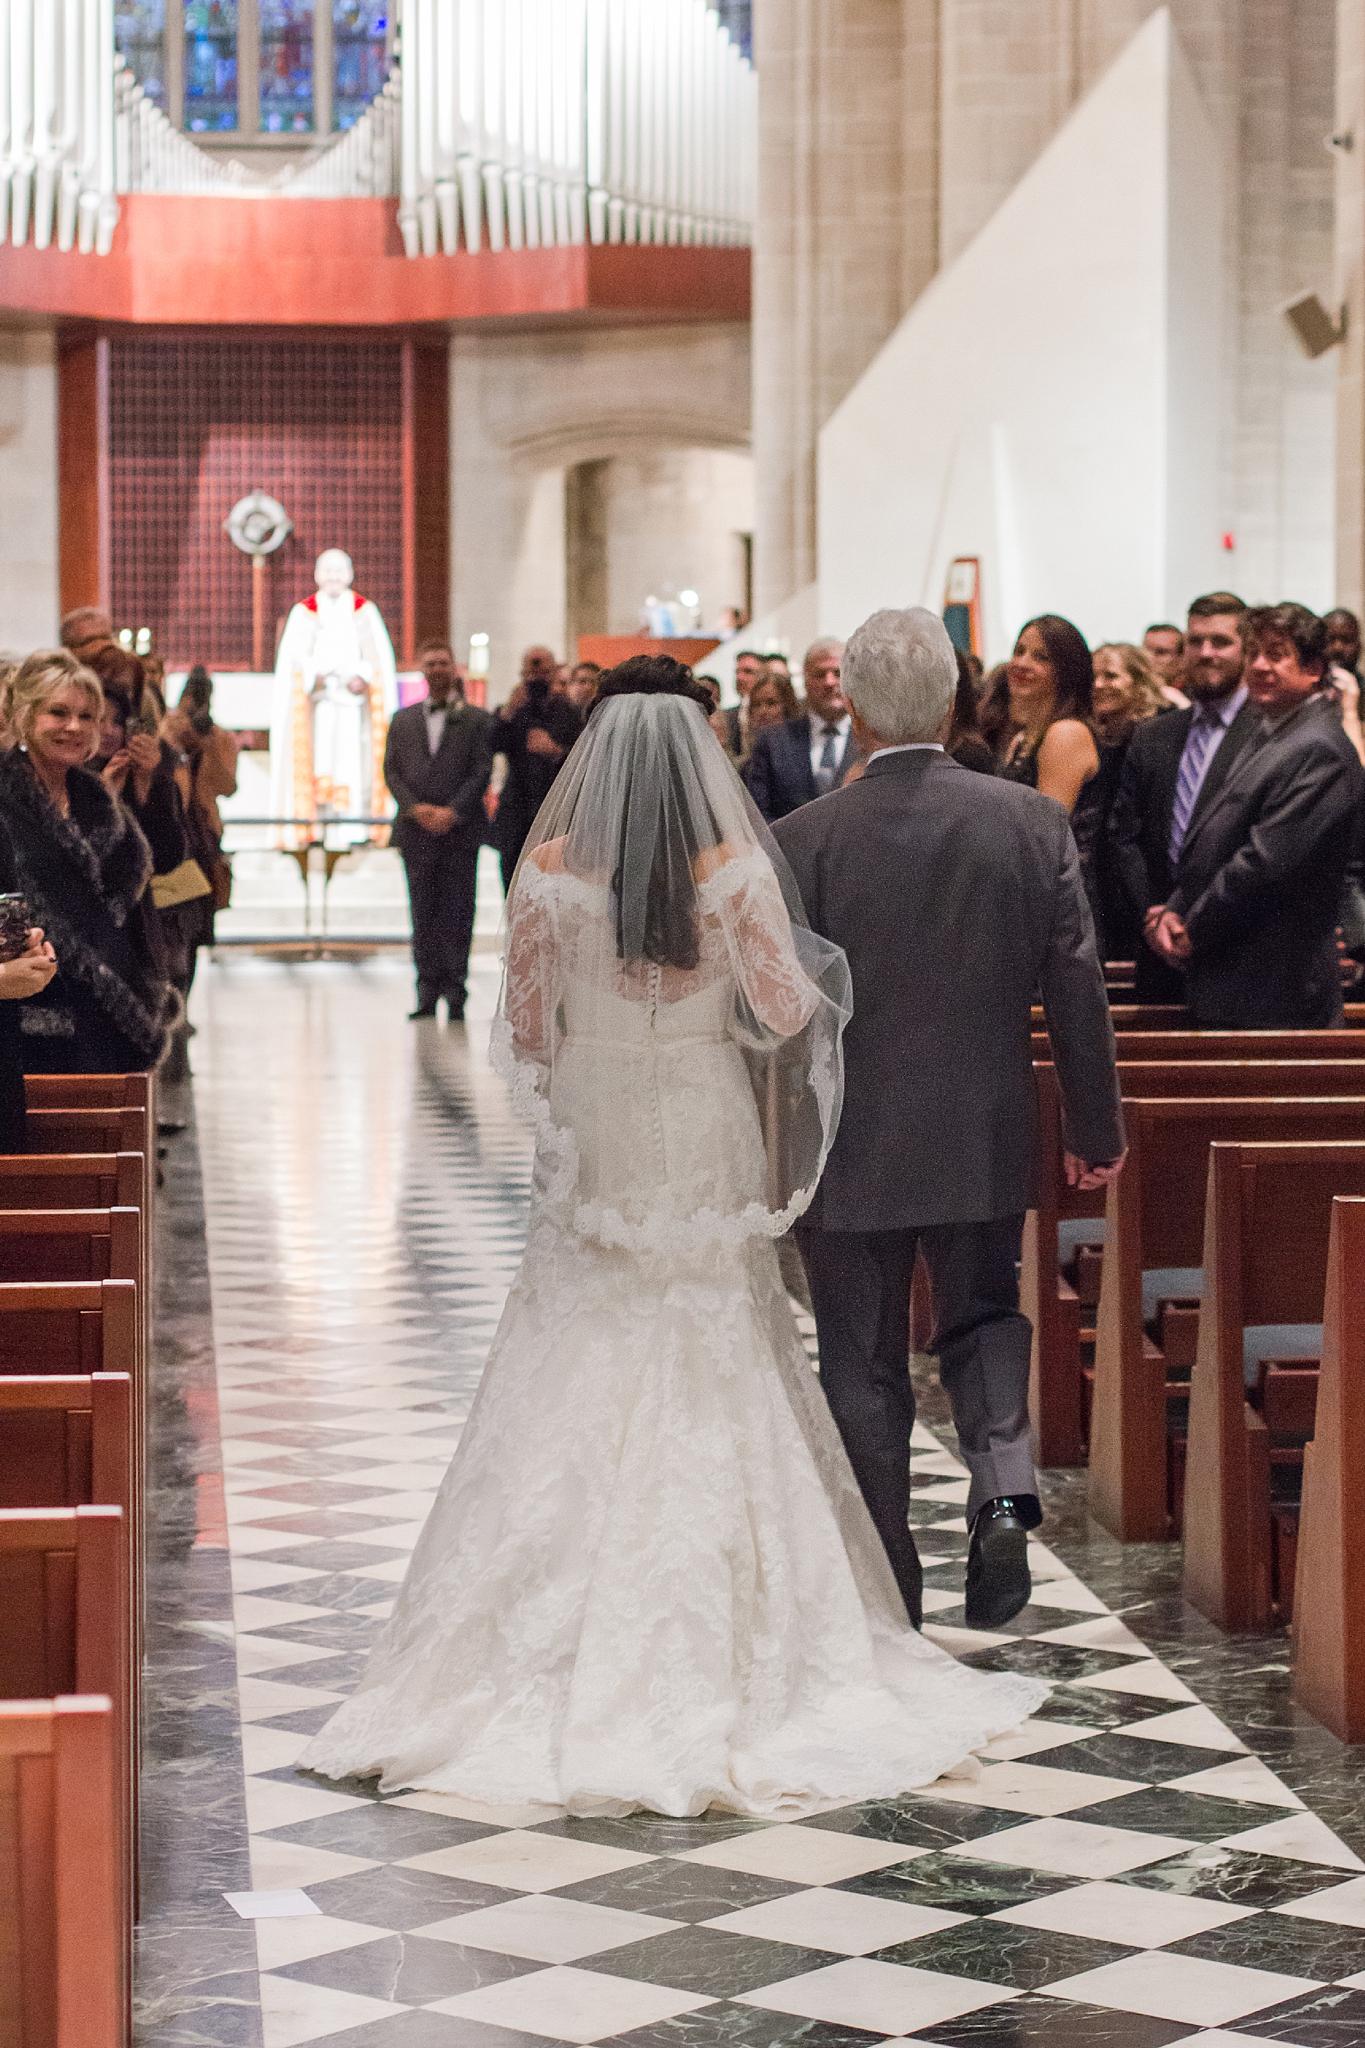 detroit-colony-club-wedding-regal-romantic-photography-in-detroit-mi-by-courtney-carolyn-photography_0024.jpg